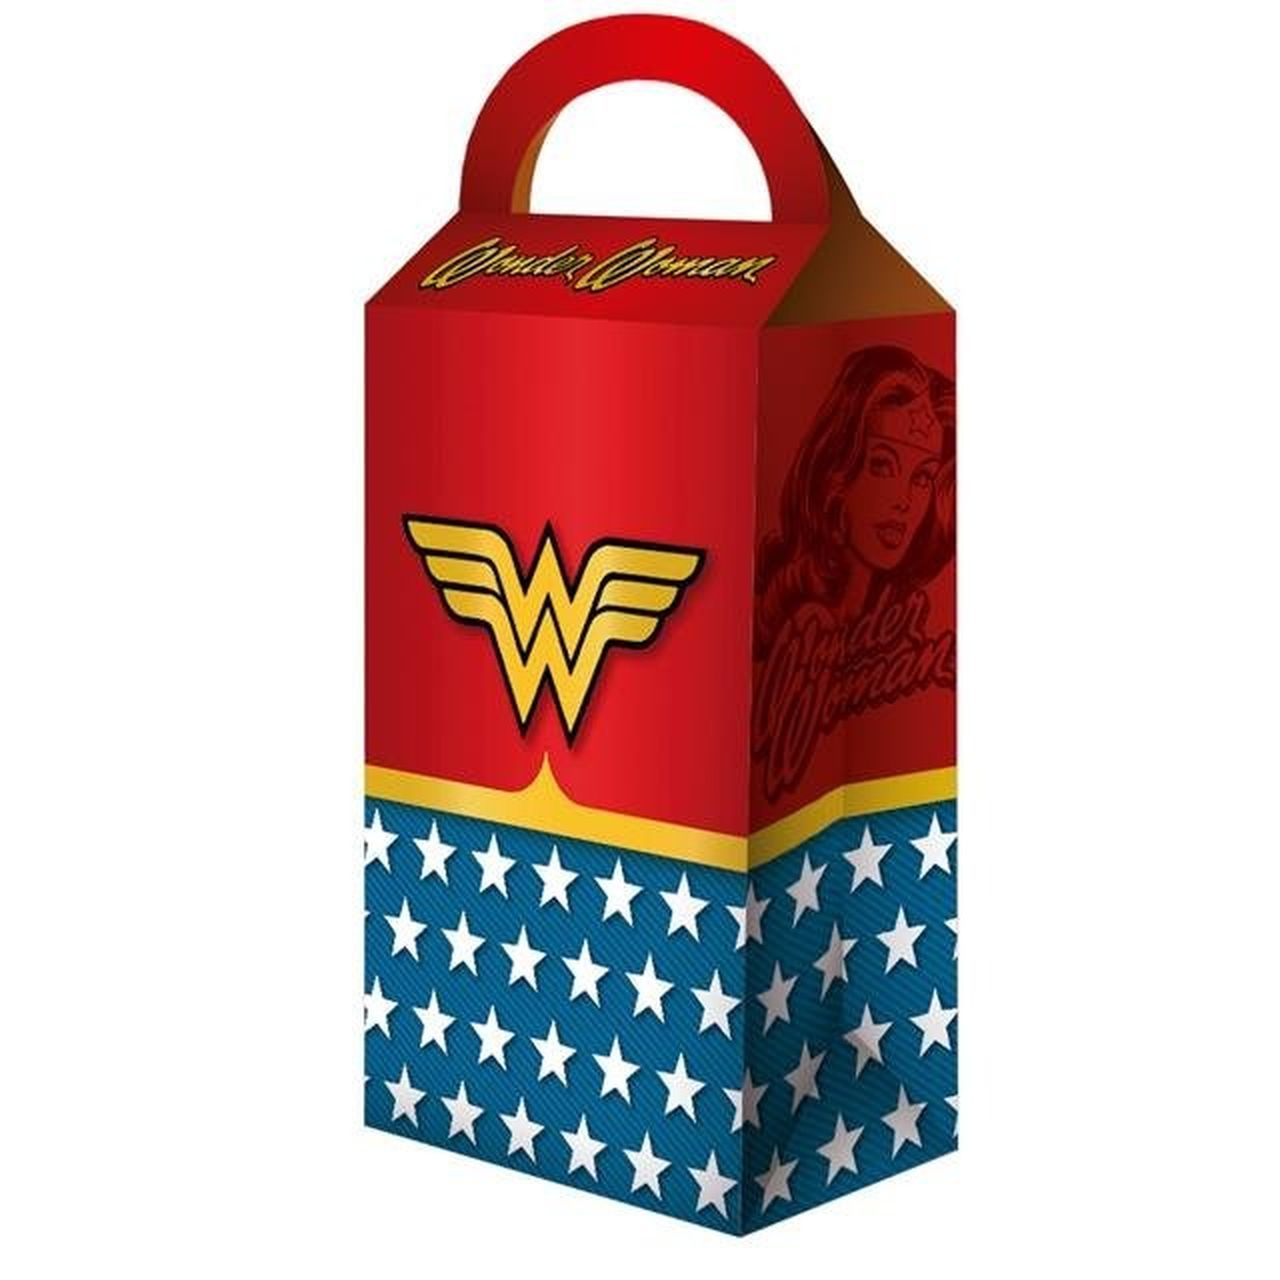 Caixa Surpresa: Wonder Woman (Mulher Maravilha) - Festcolor